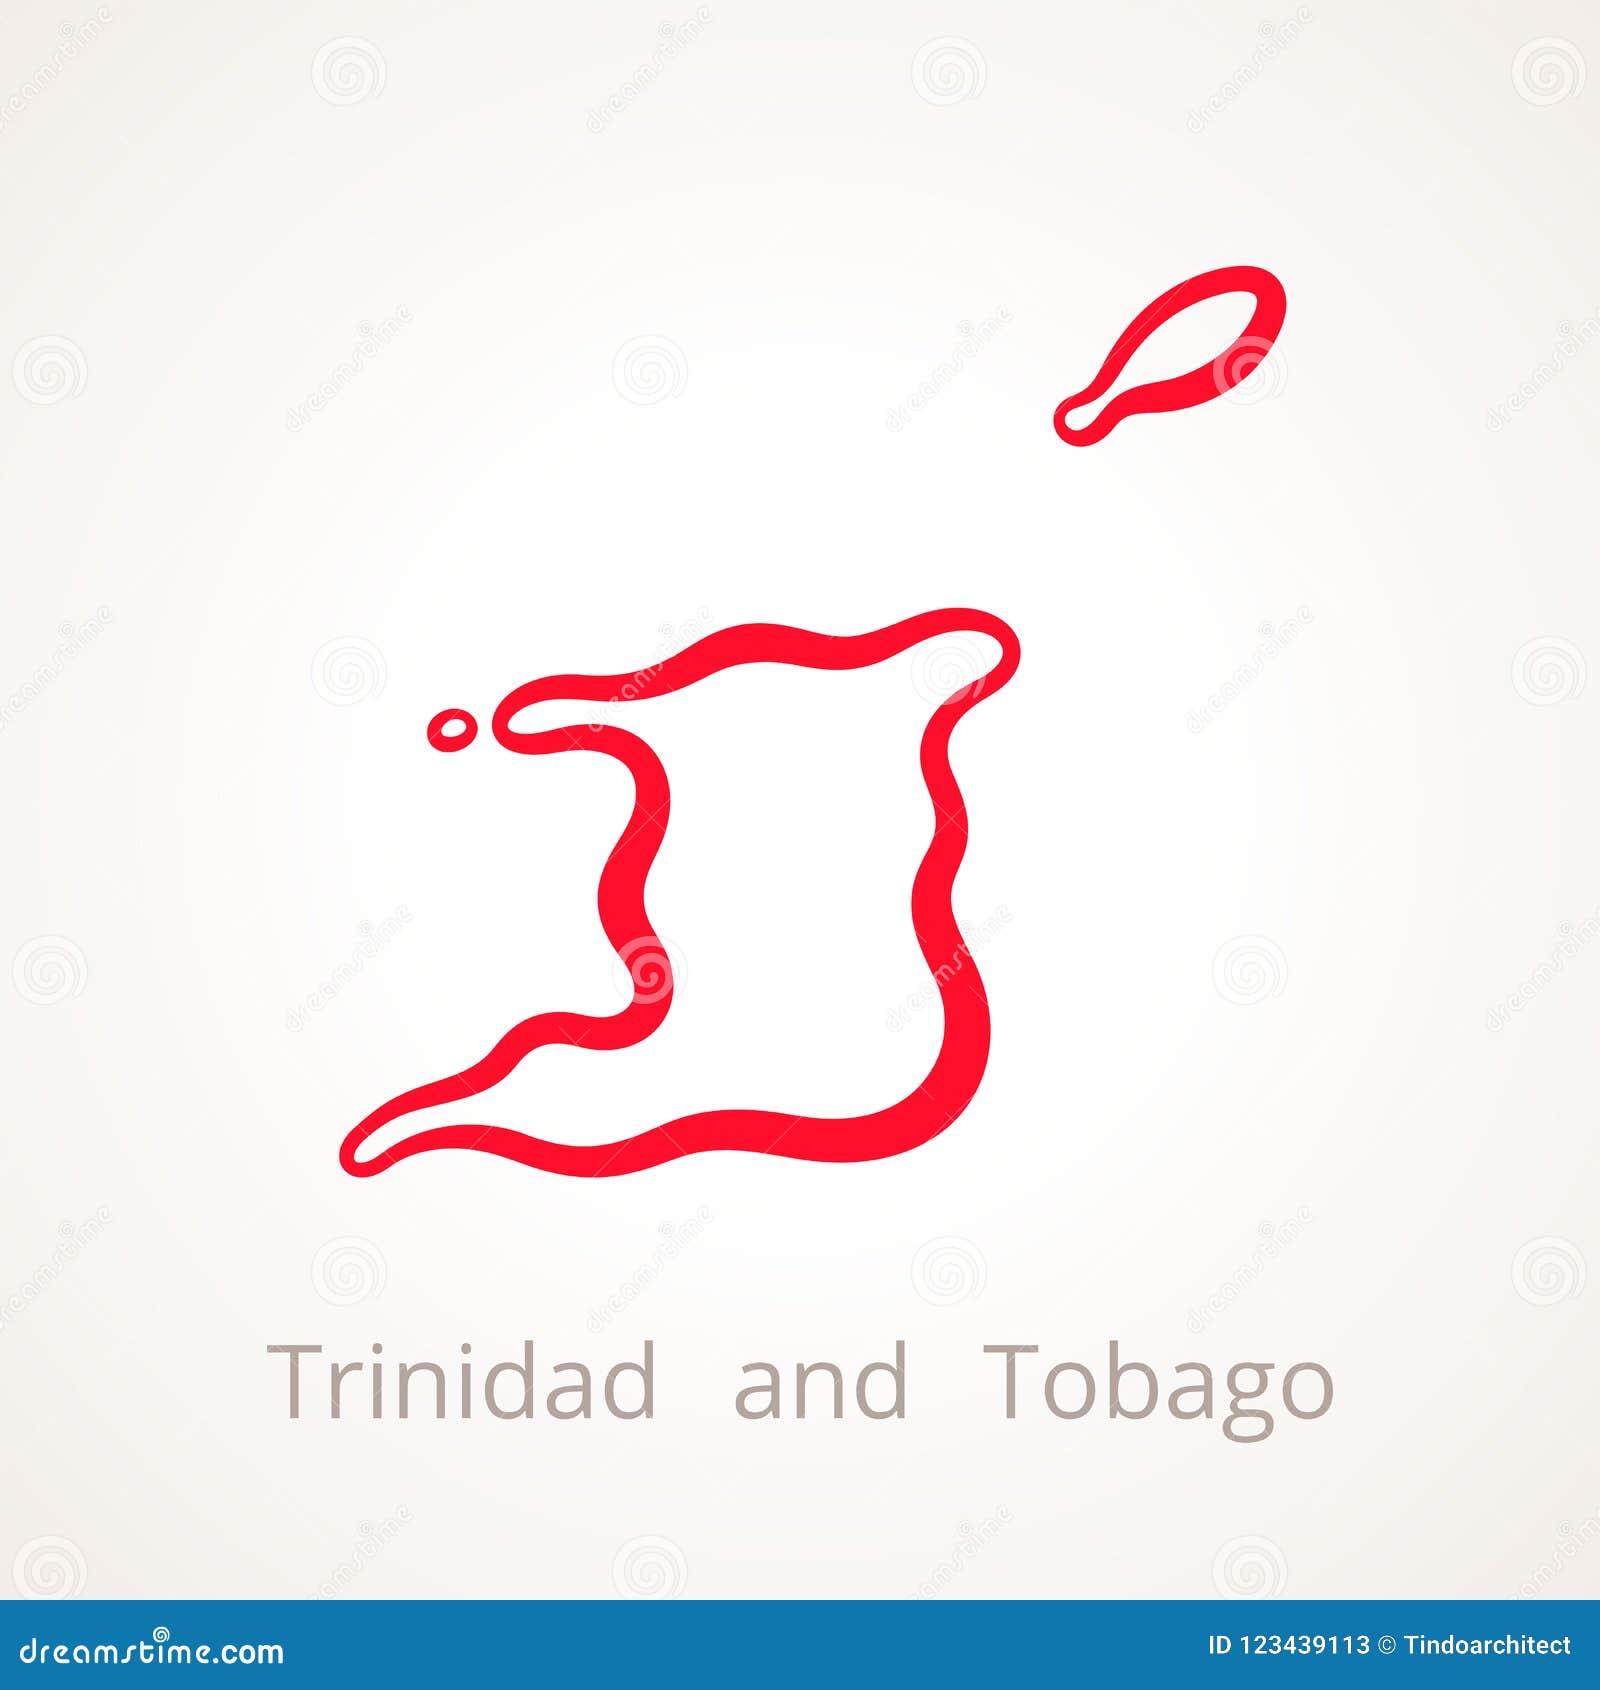 Trinidad And Tobago - Outline Map Stock Vector ...